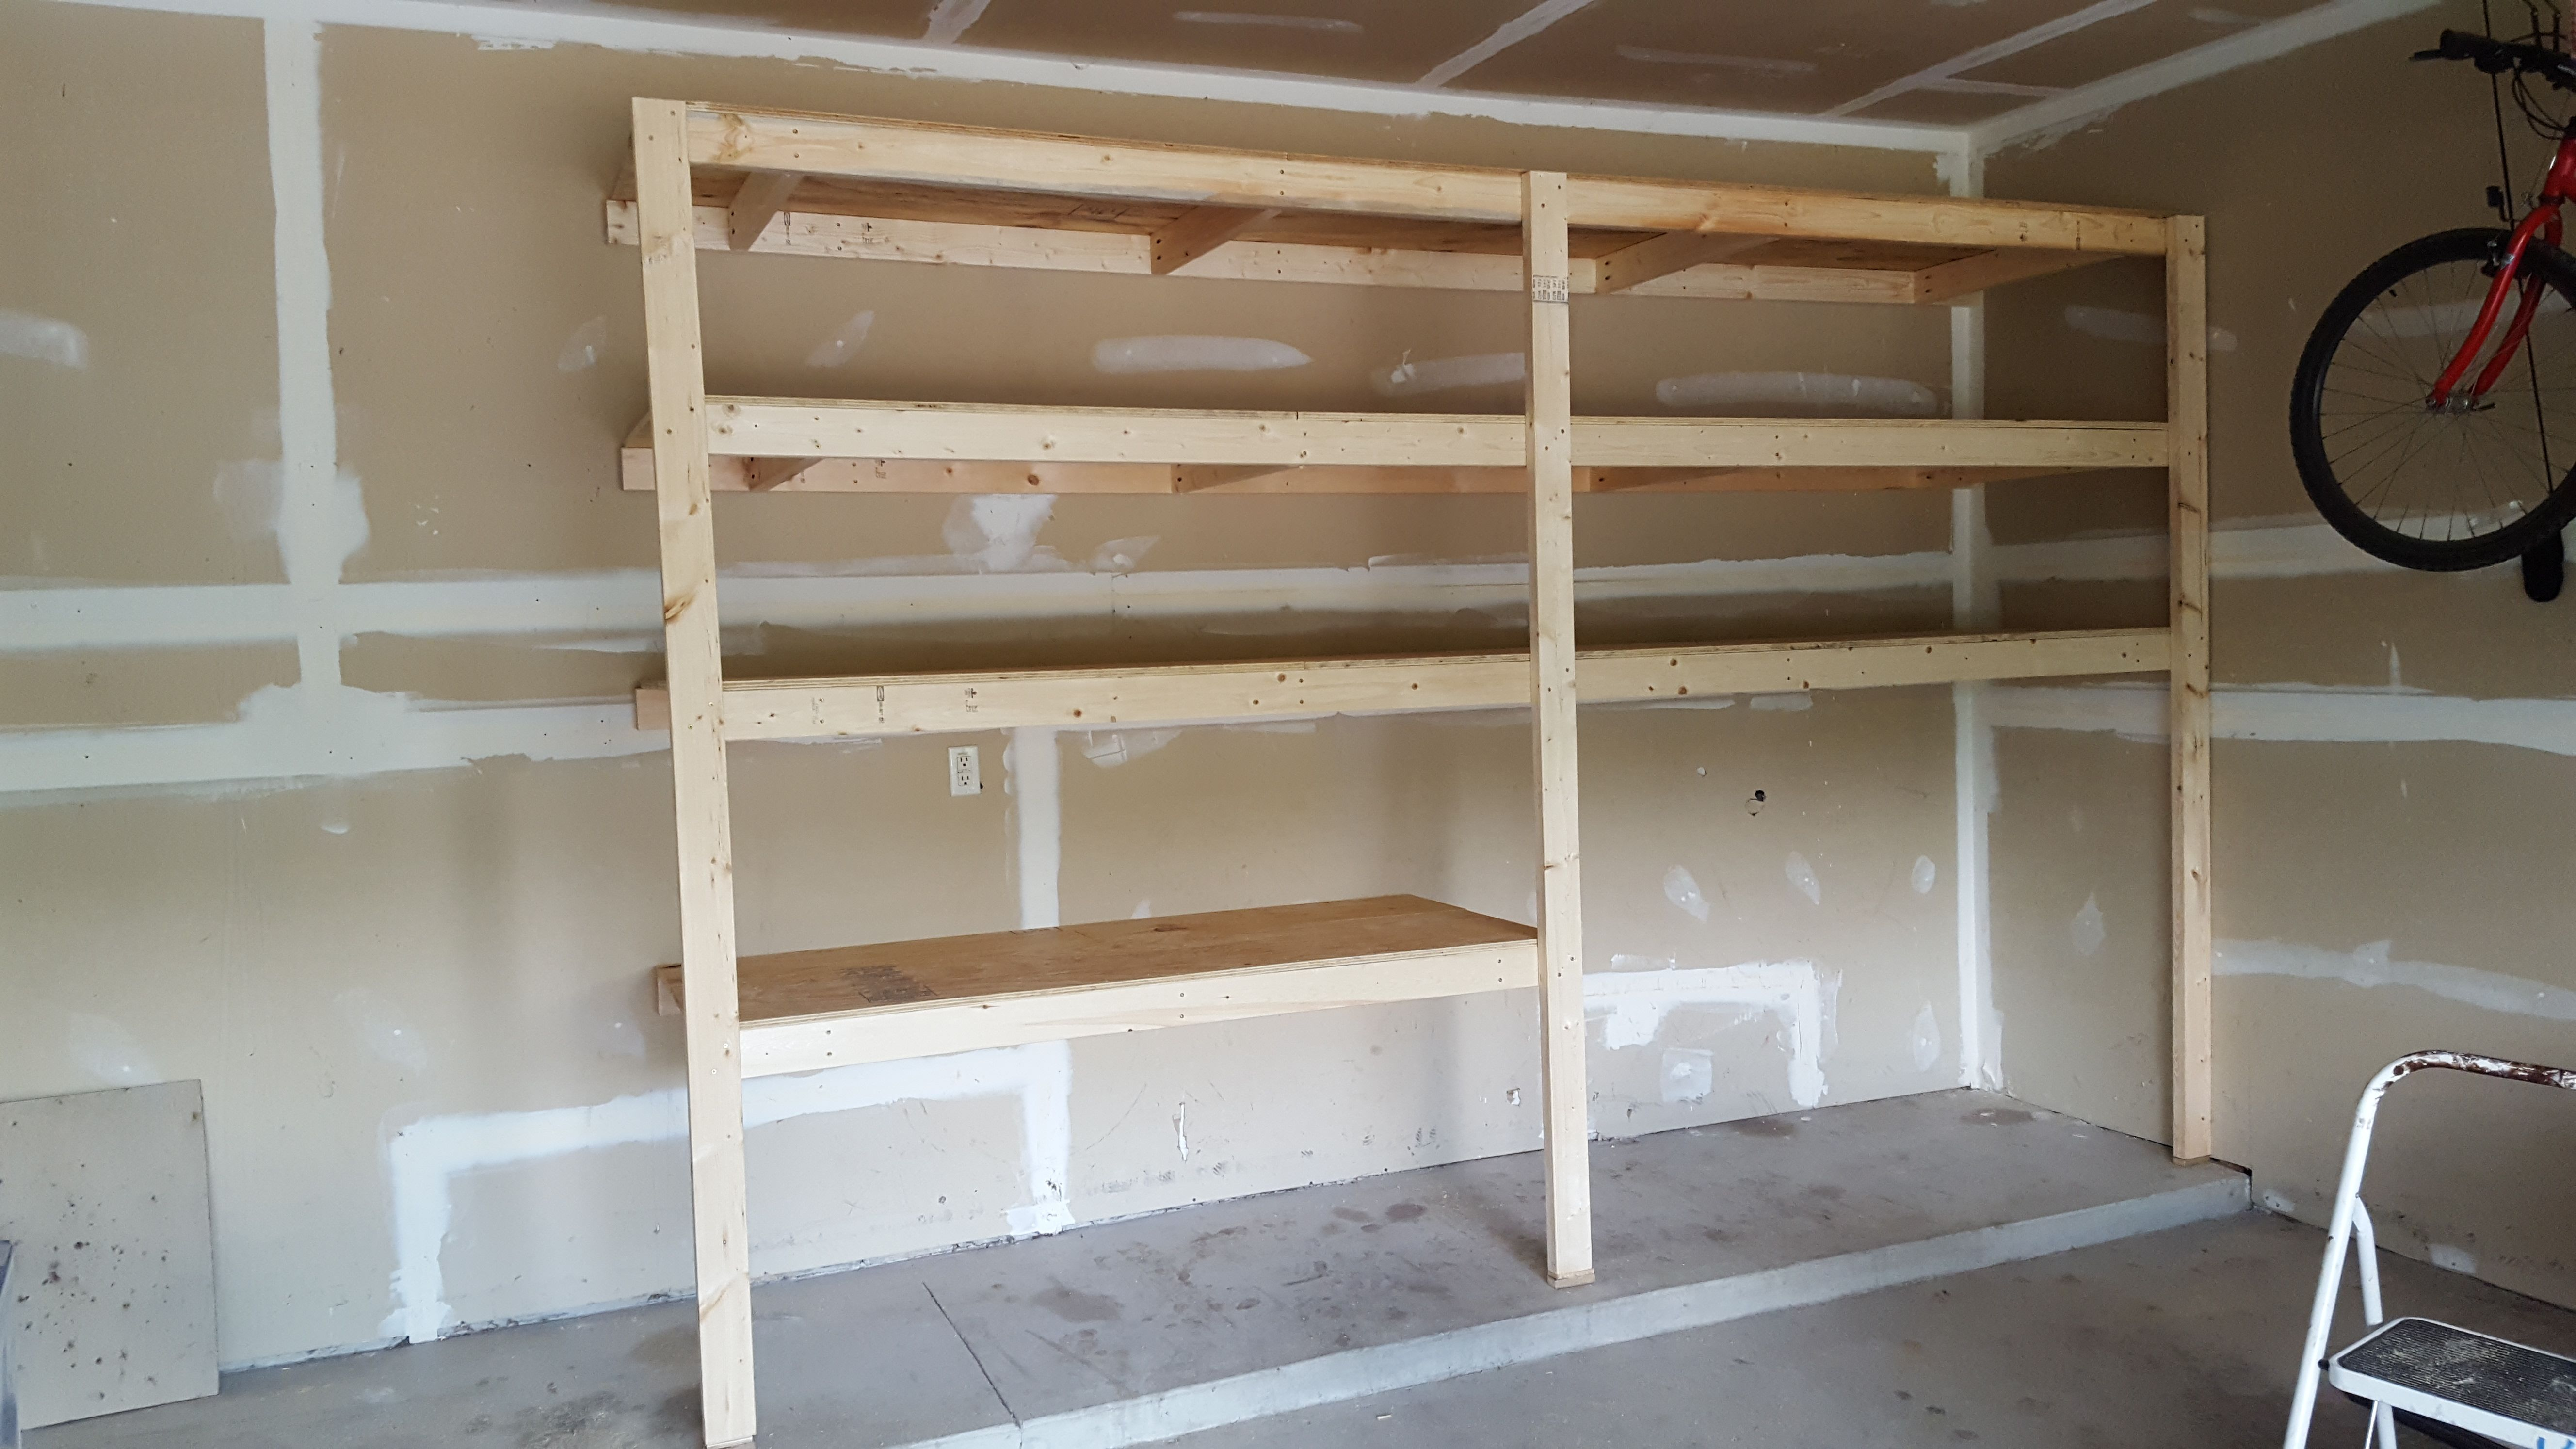 Ana White Garage Shelves Diy Projects Diy Storage Shelves